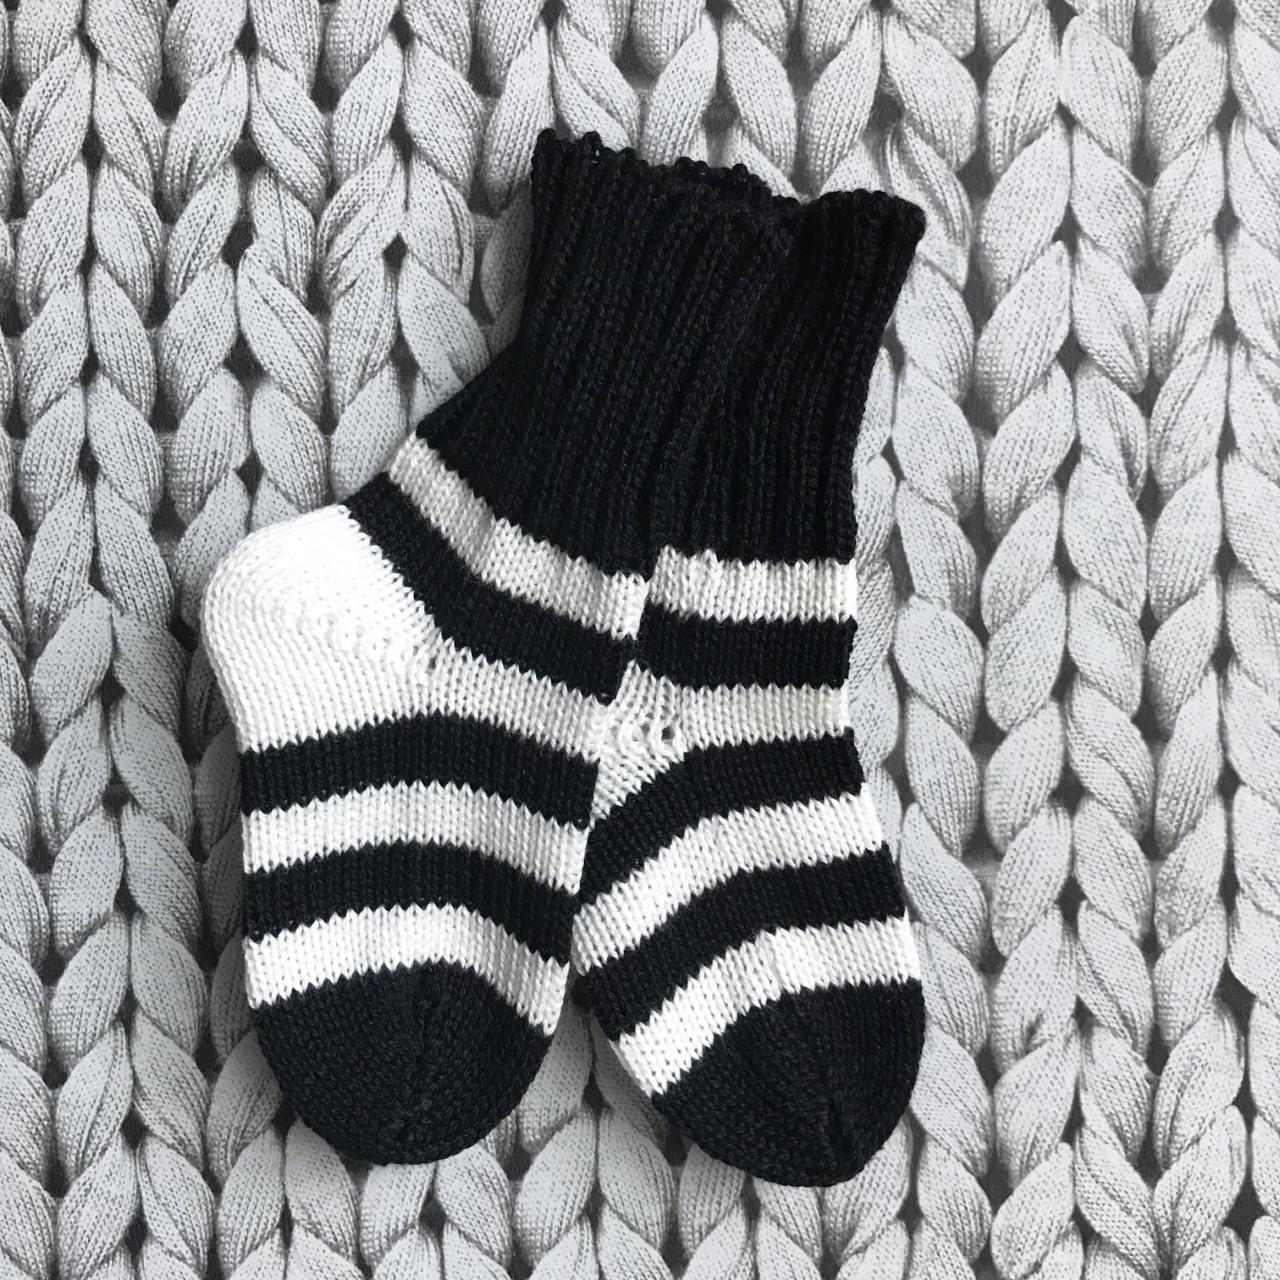 svart/vit barnsocka